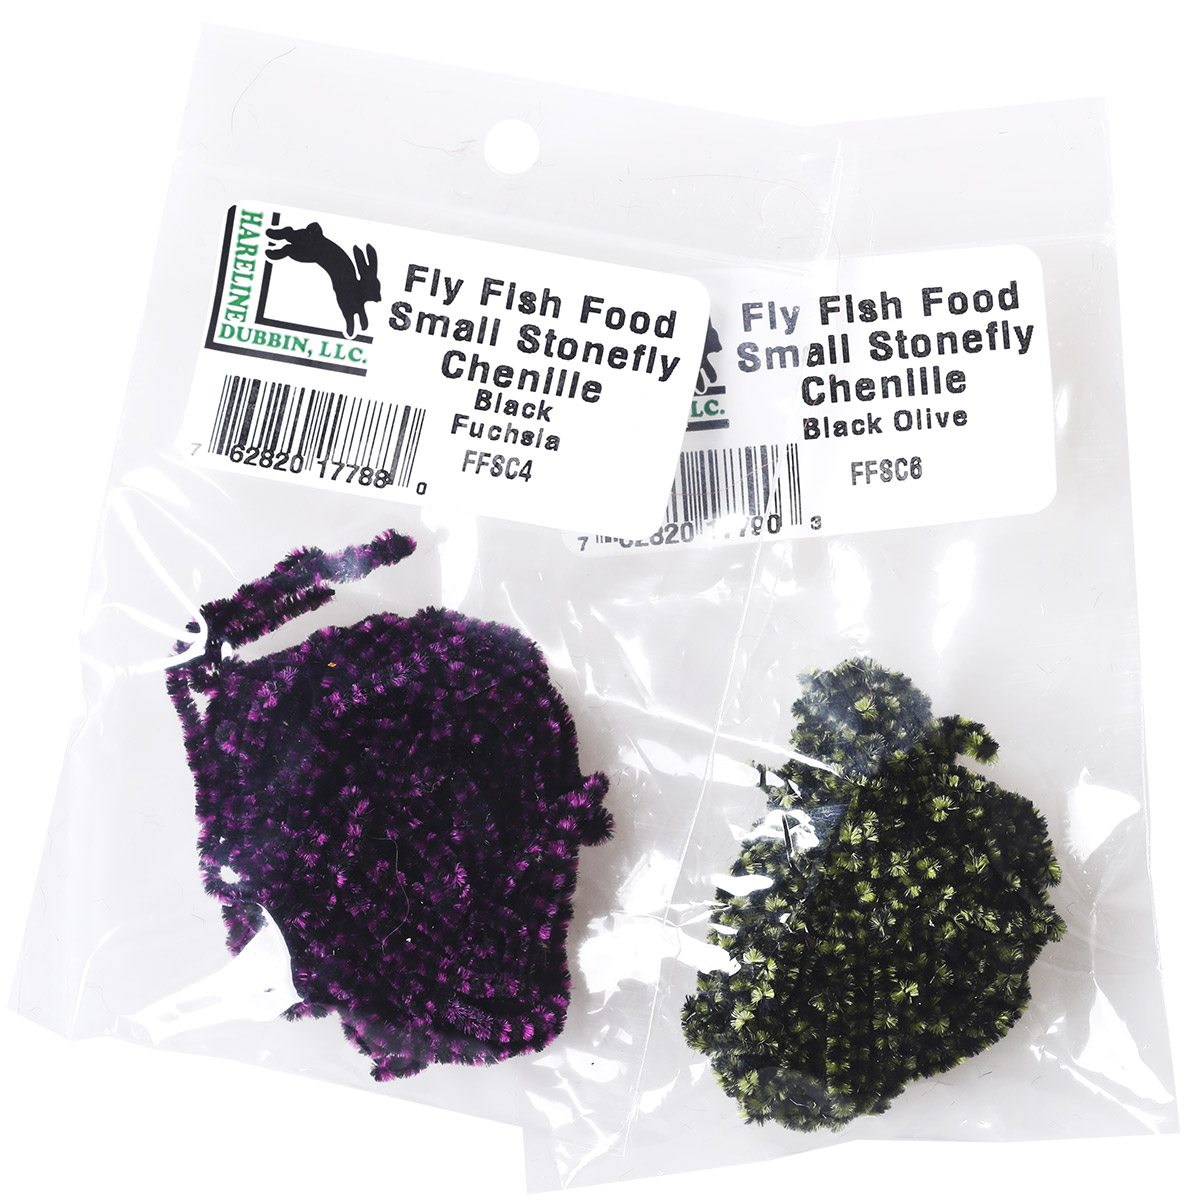 Hareline Fly Fish Food Small Stonefly Chenille